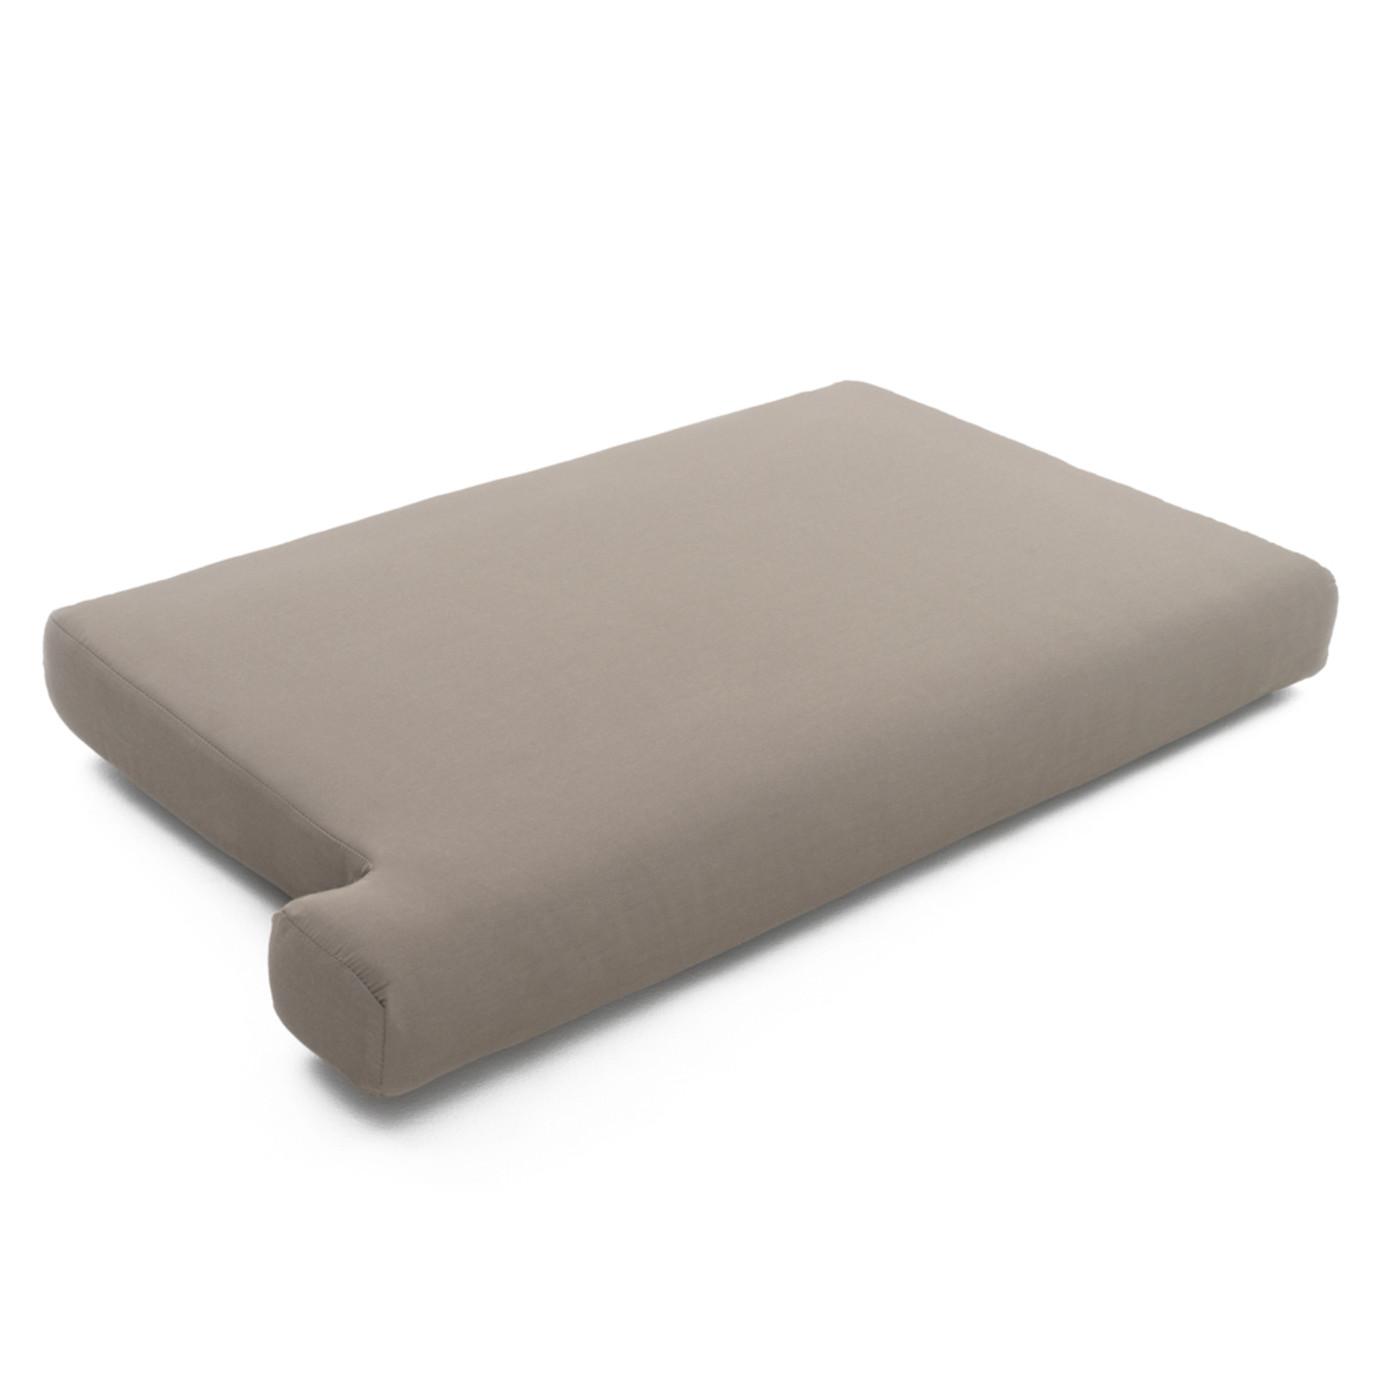 Portofino Comfort 96in Sofa Right Base Cushion Kona Taupe